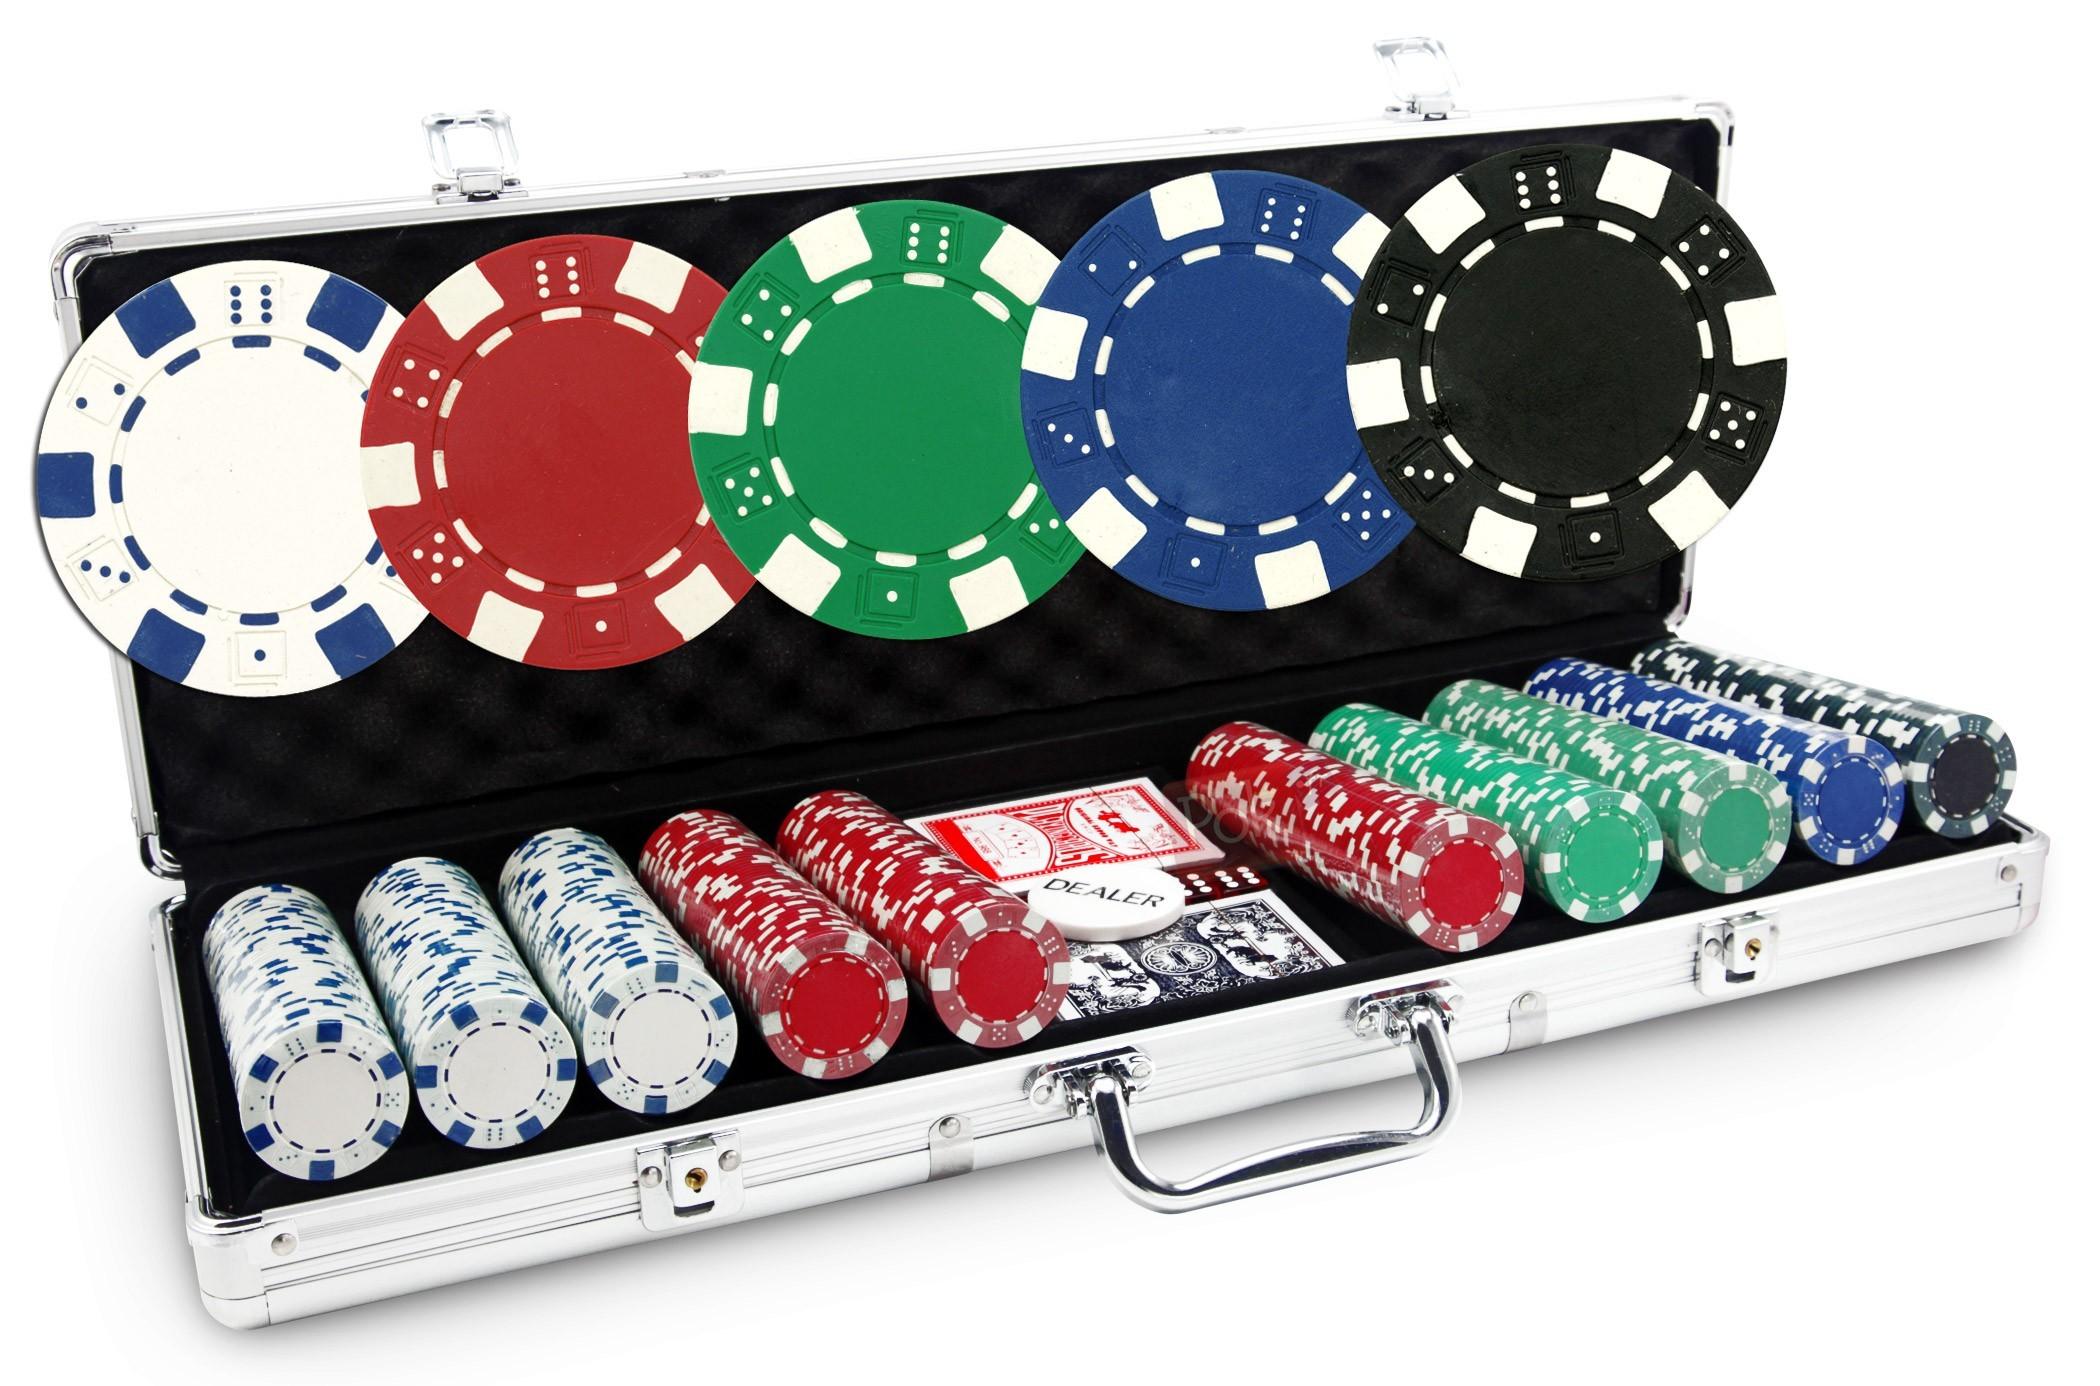 malette jetons poker